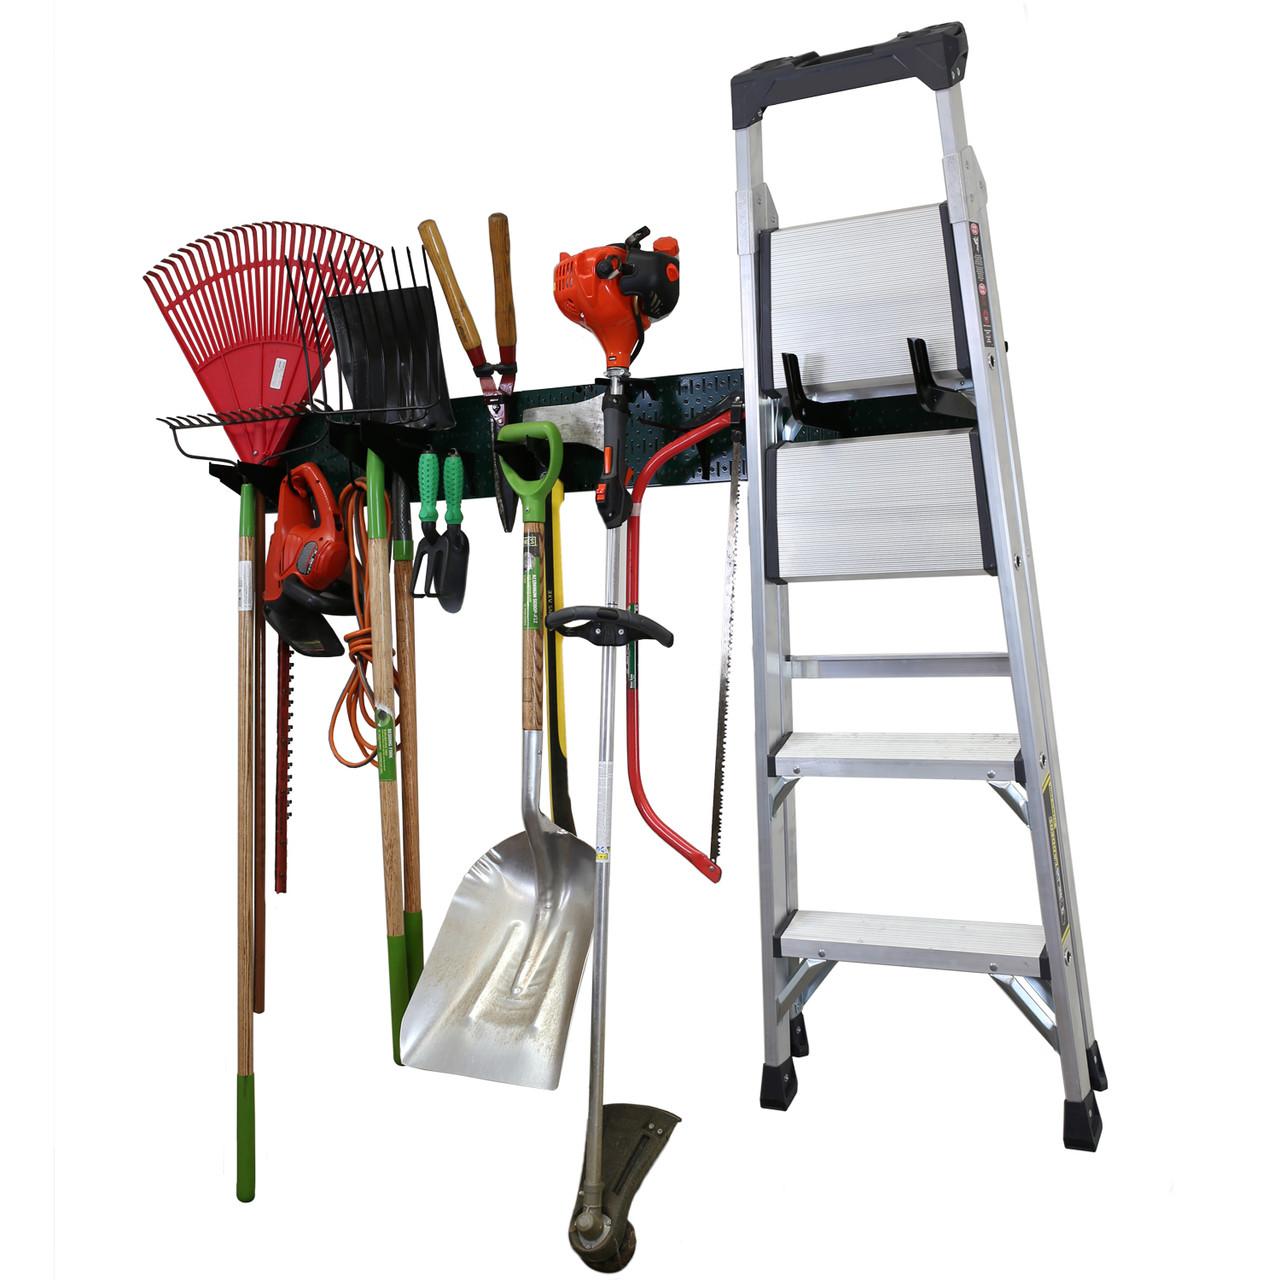 garage storage lawn & garden tool organization wall organizer rack - green  pegboard with accessories